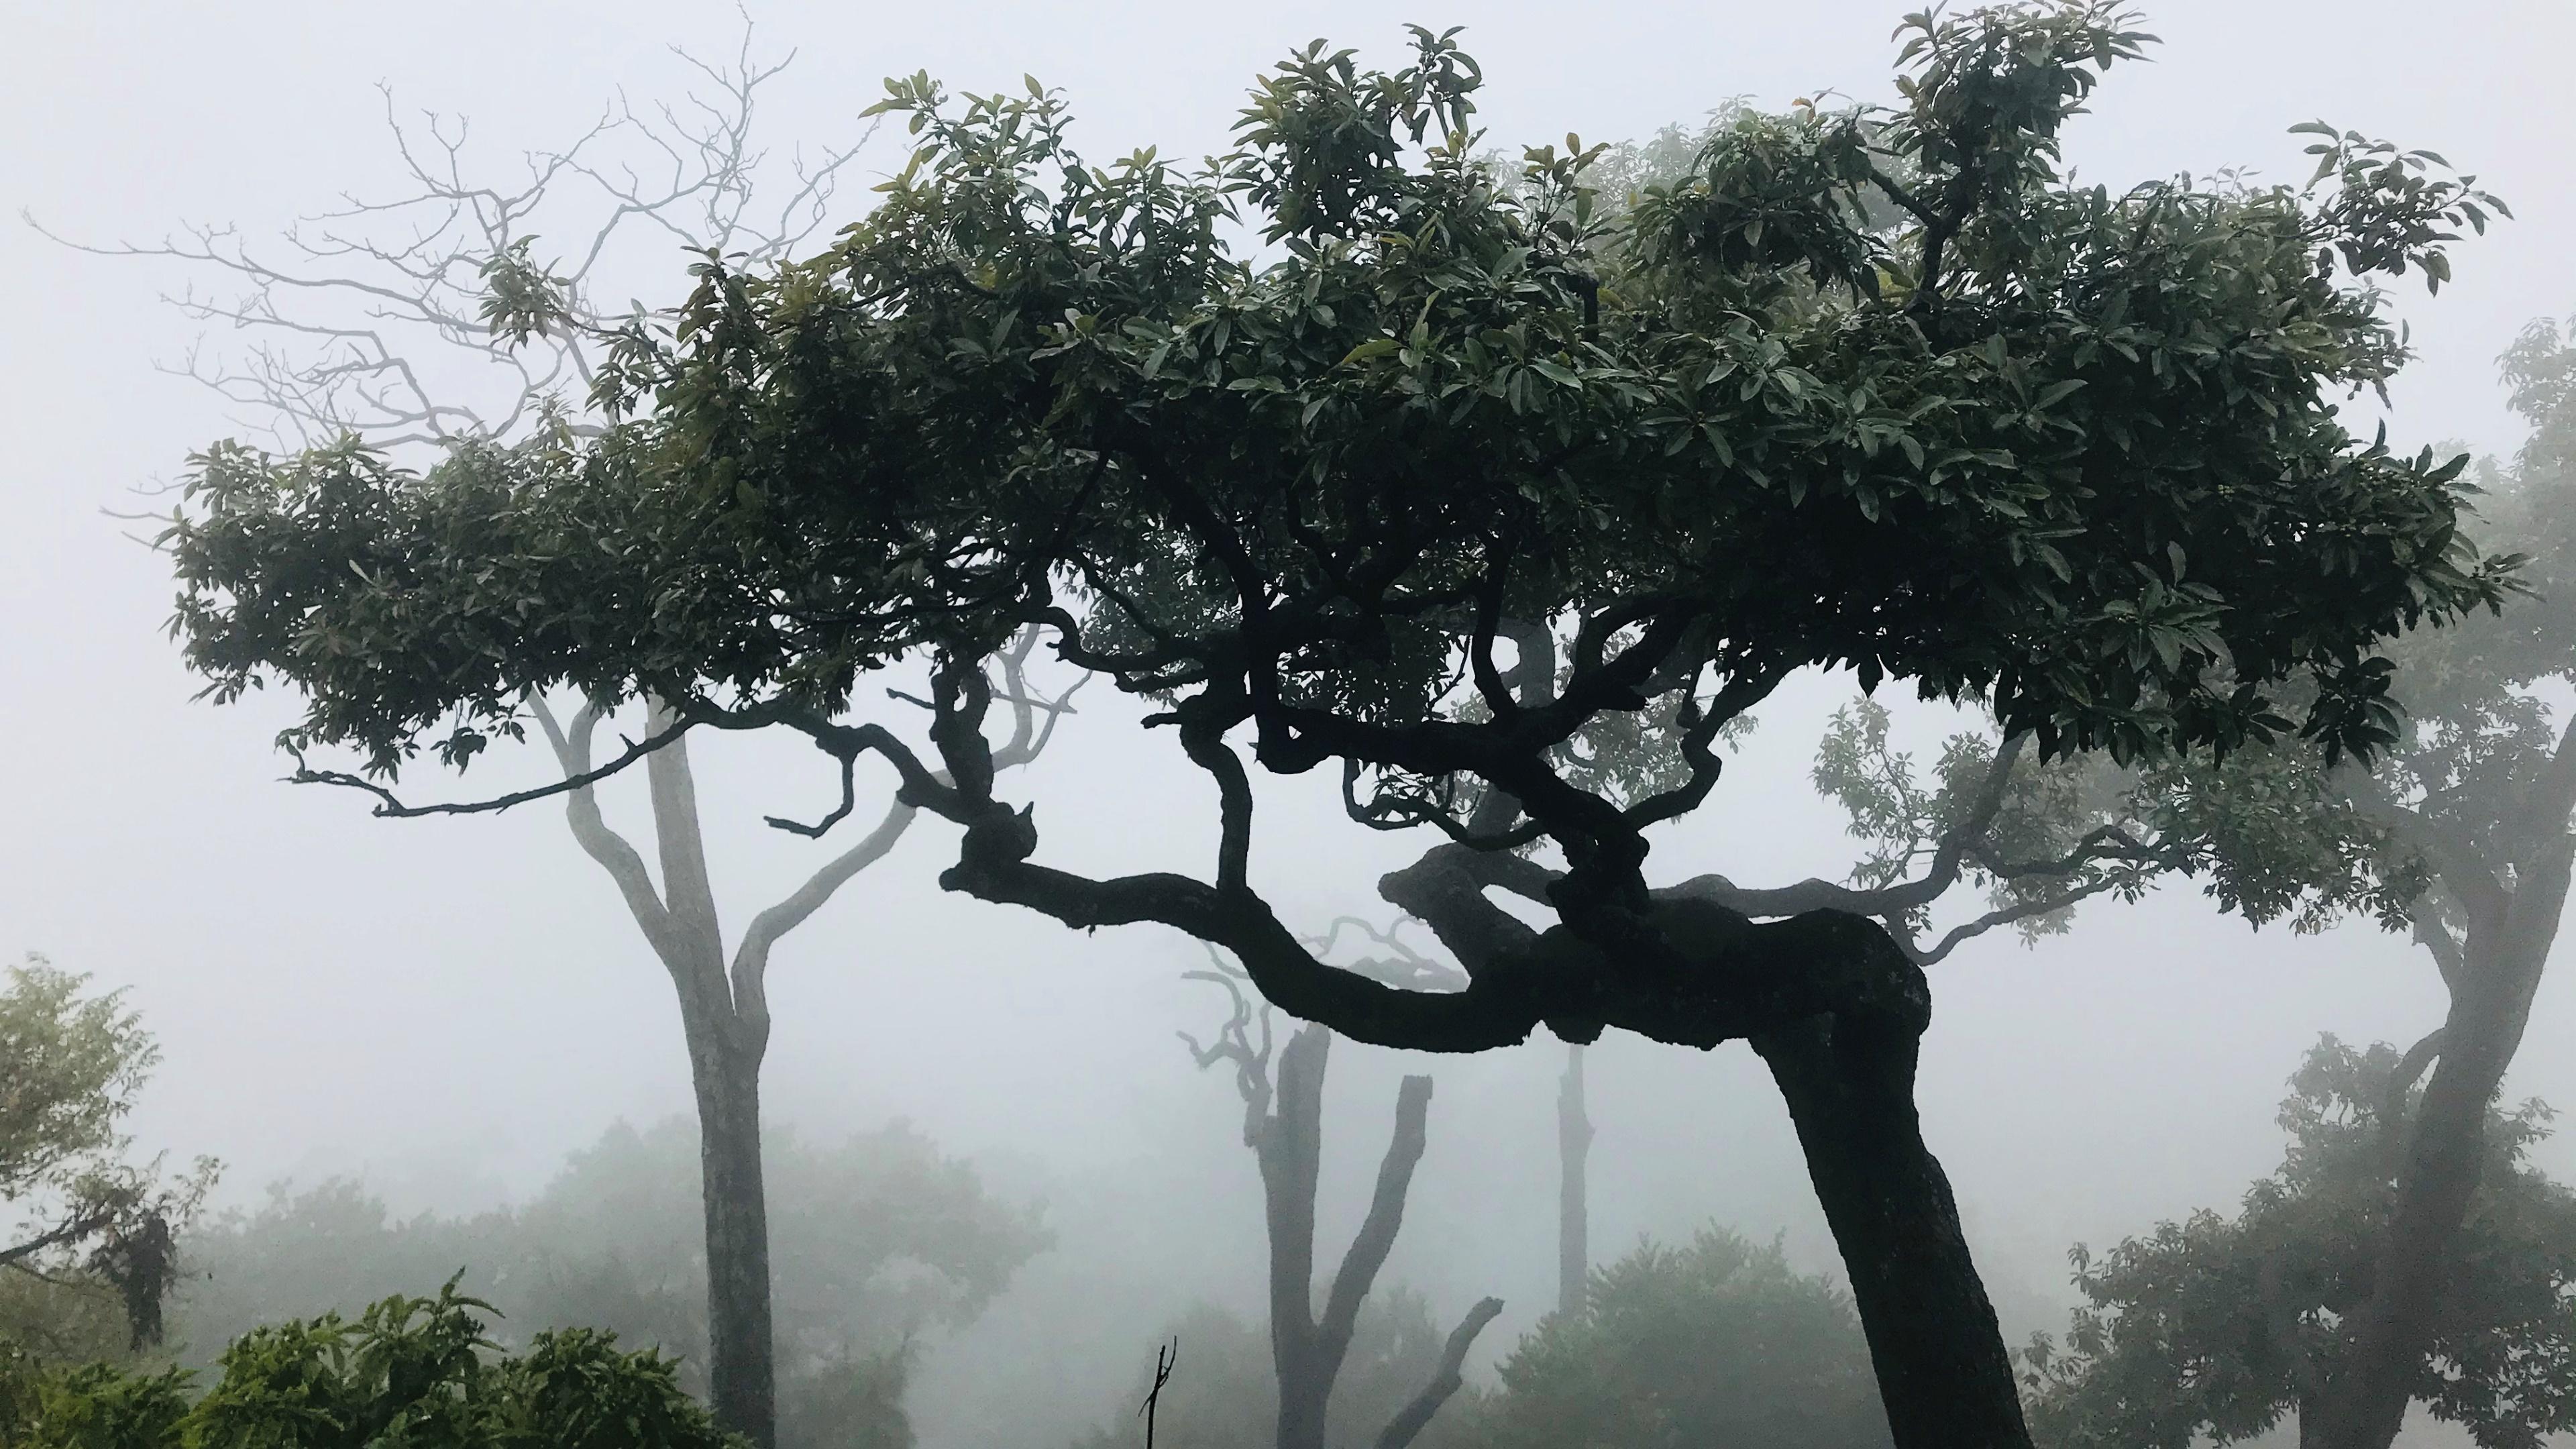 Trees in haze wallpaper